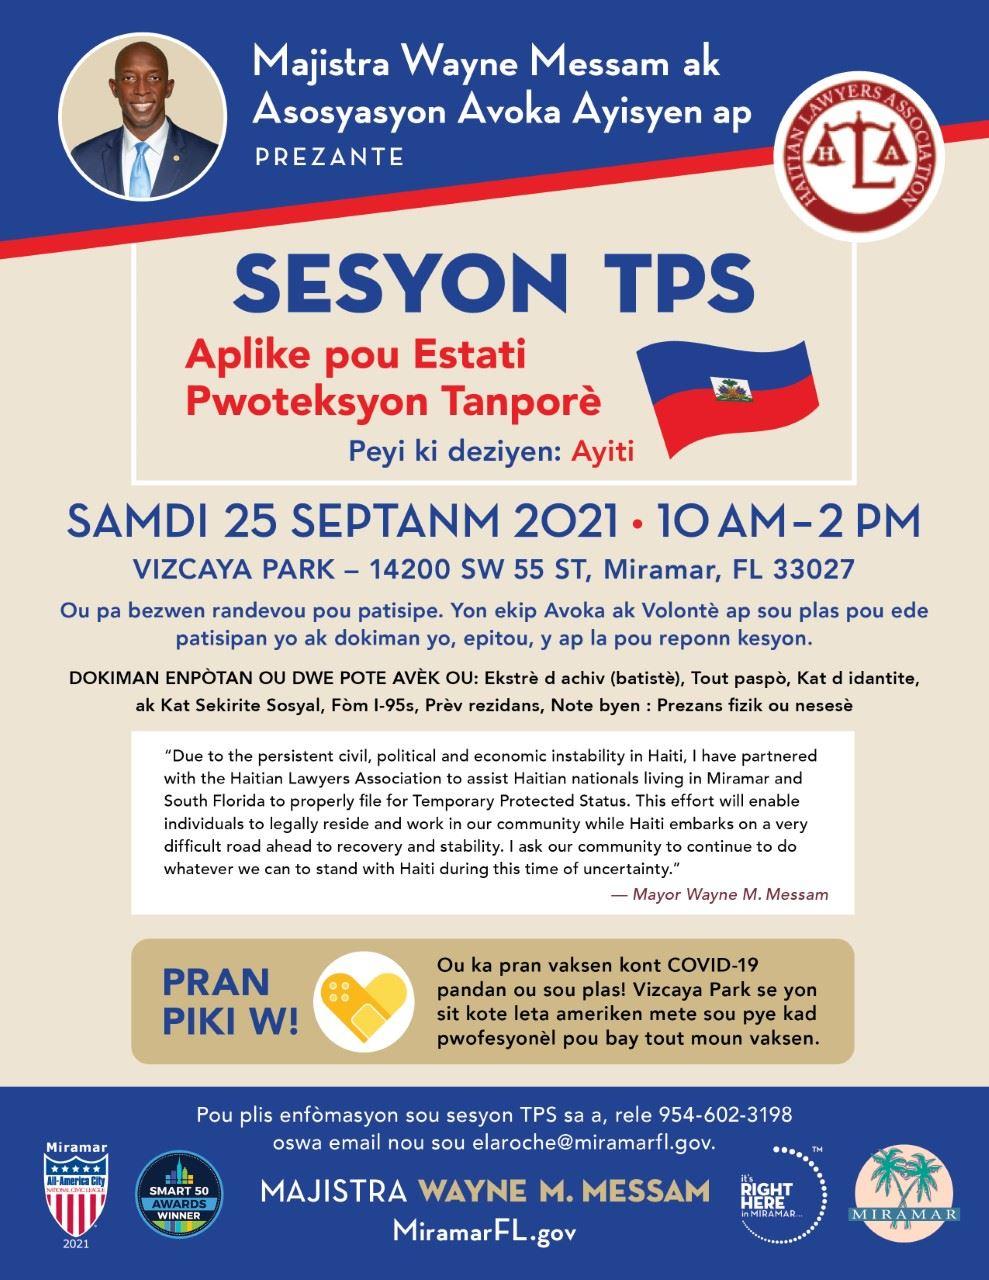 Mayor Messam TPS Session Haiti 2021 CRE Flyer-1